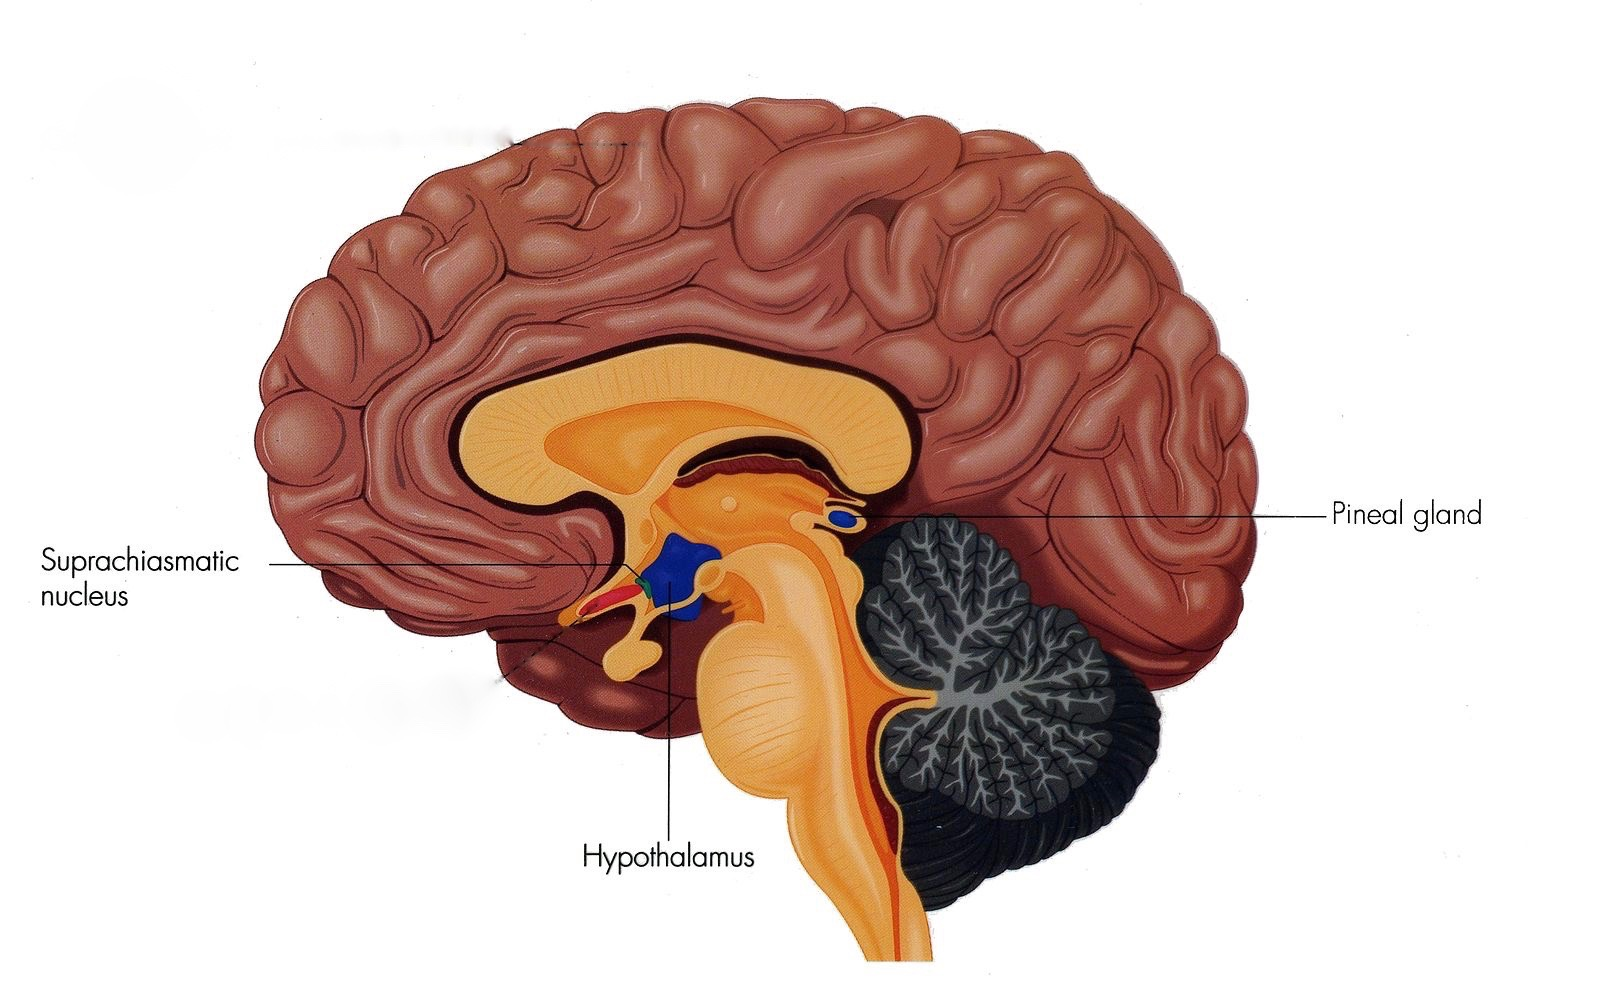 Taking Melatonin but Still Can't Sleep? | Psychology Today